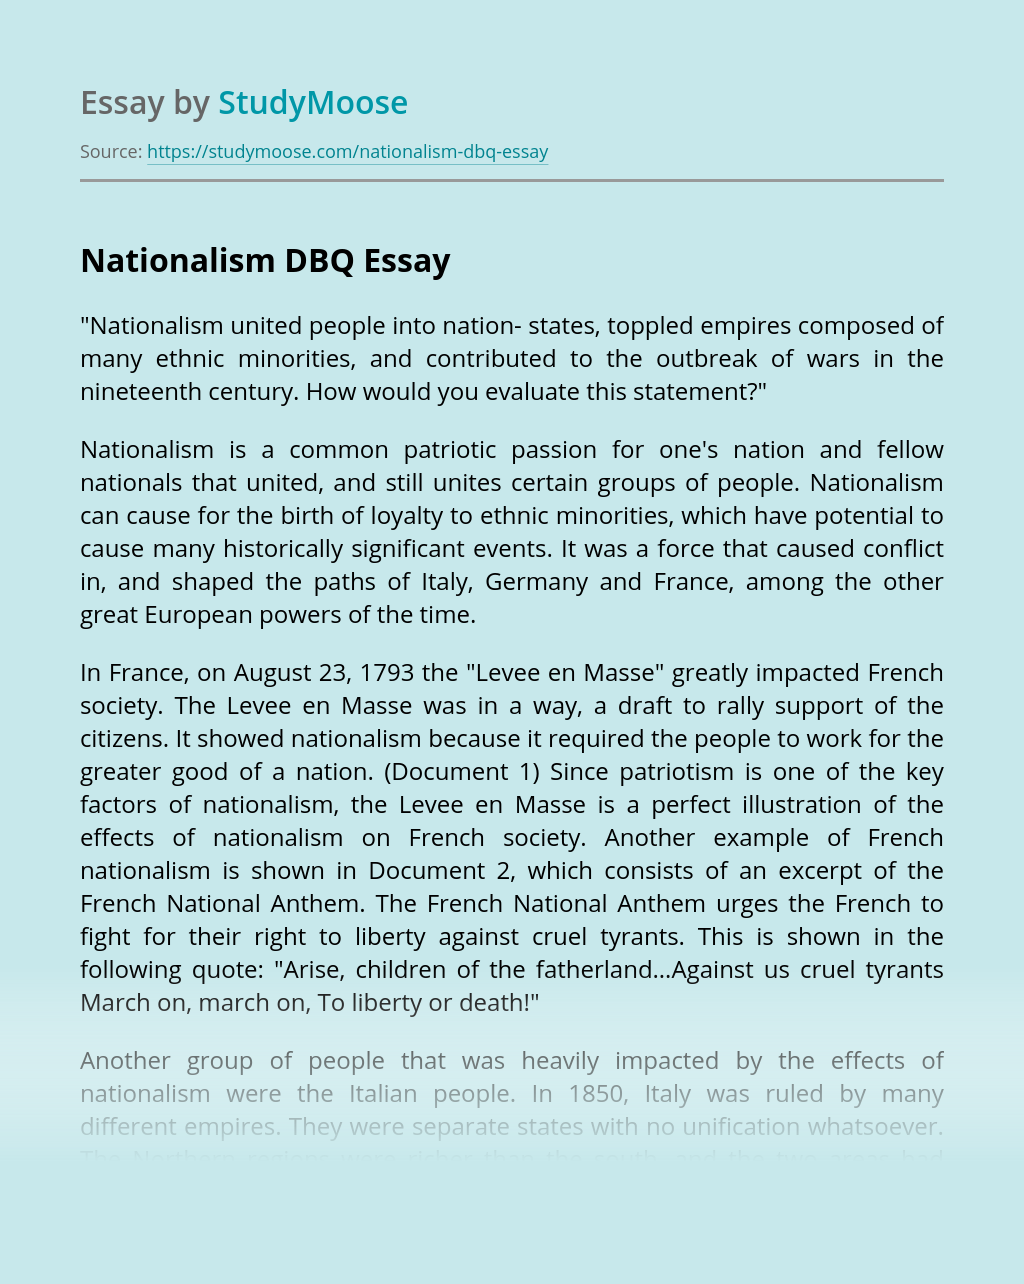 Nationalism DBQ